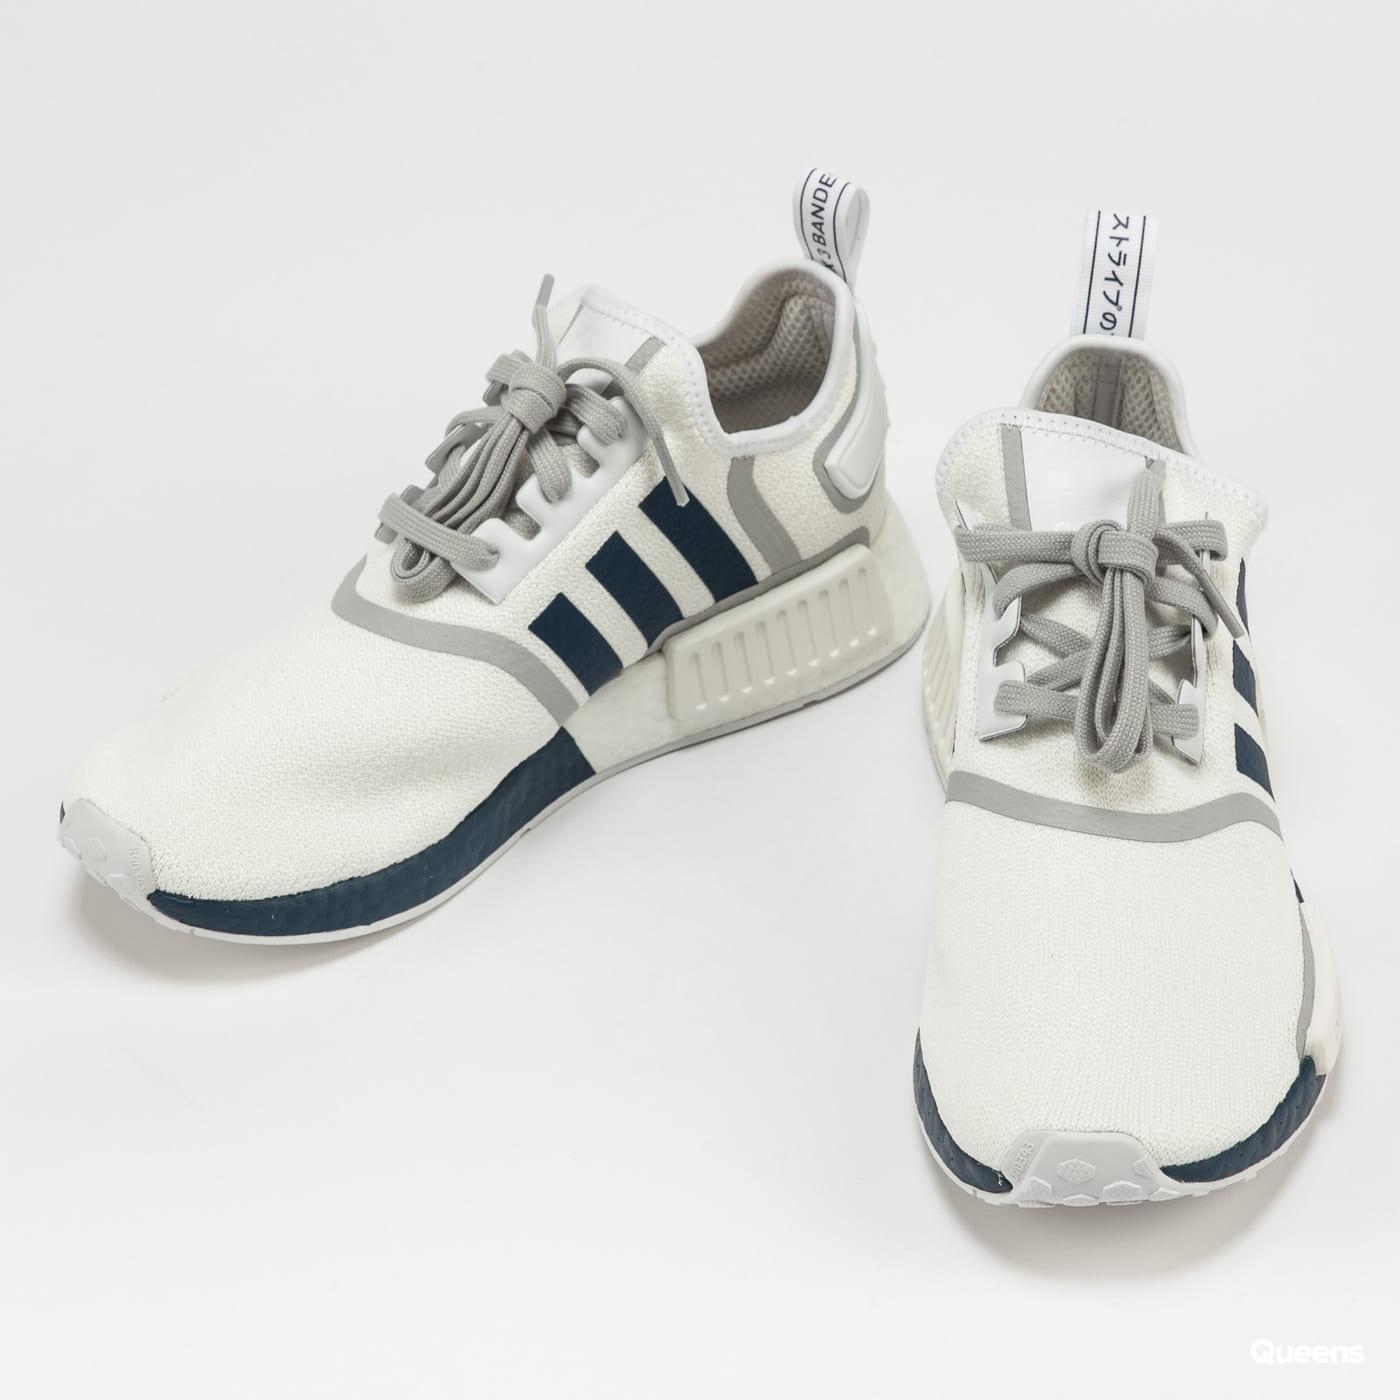 adidas Originals NMD_R1 cloud white / crew navy